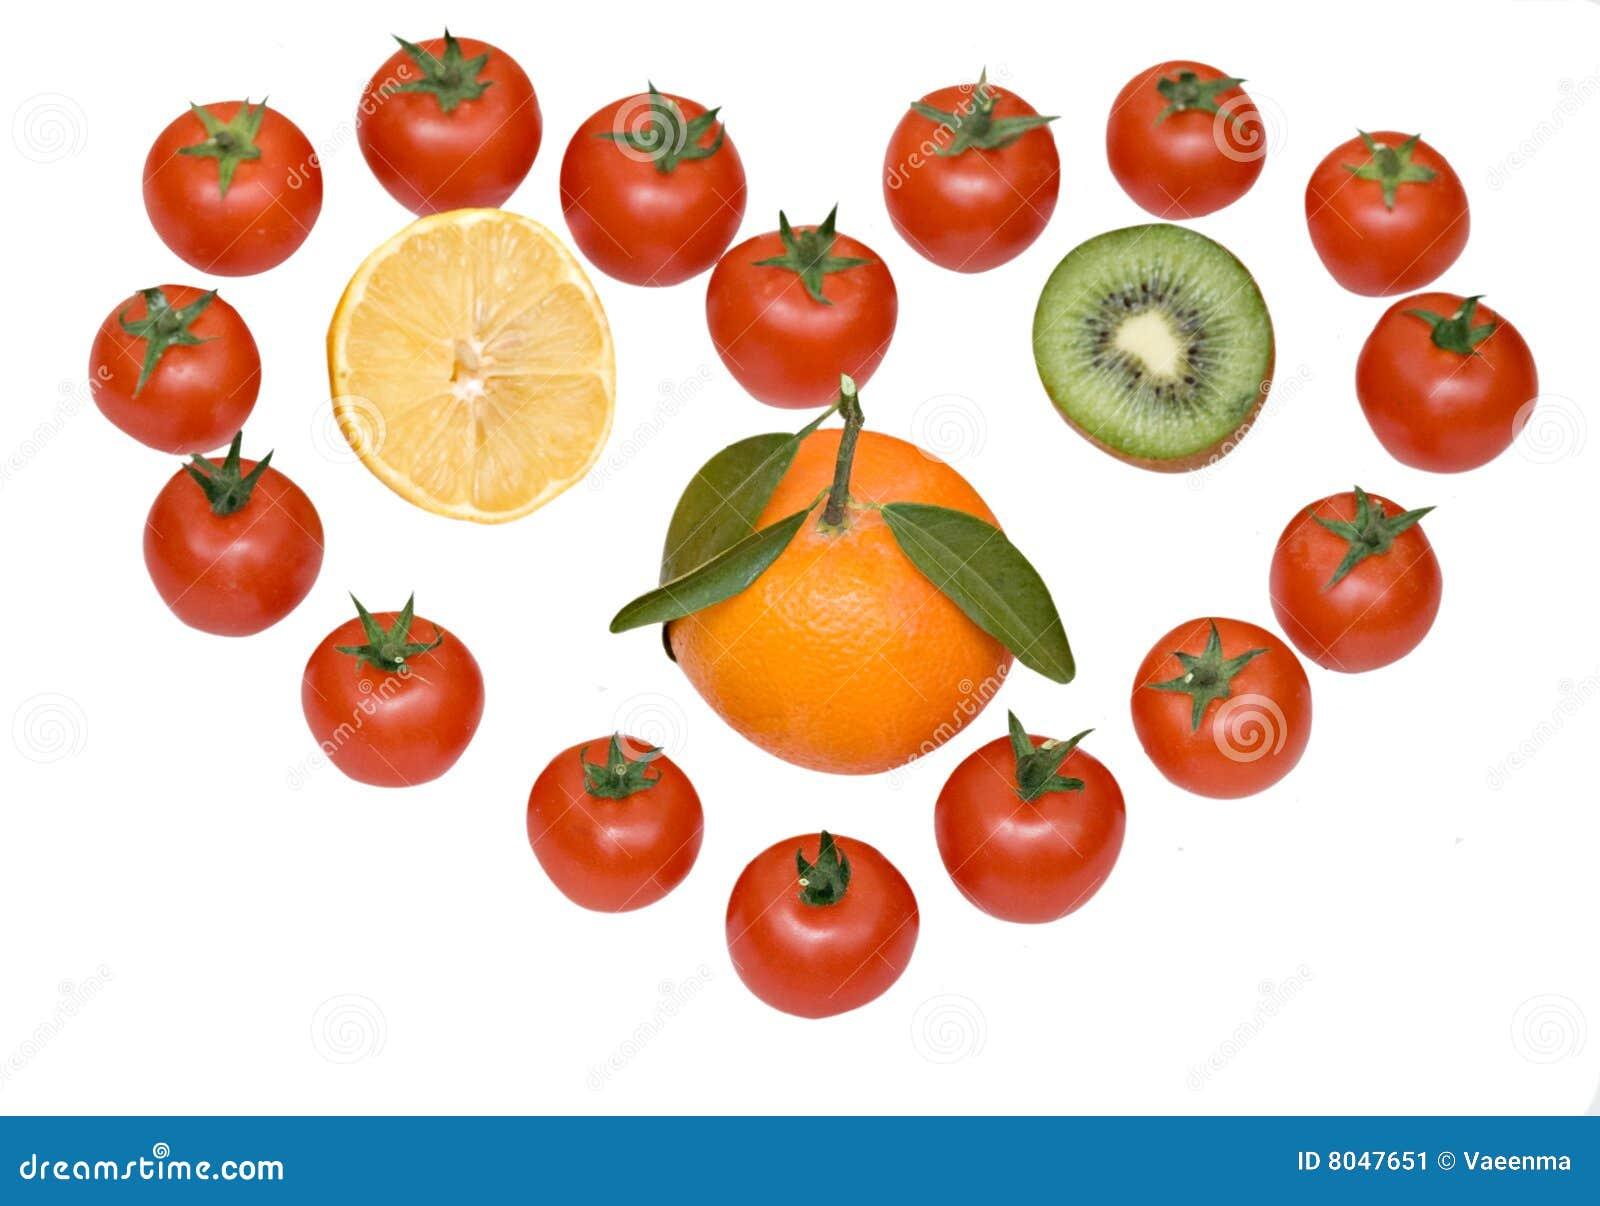 Samenstelling die liefde voor vruchten symboliseert